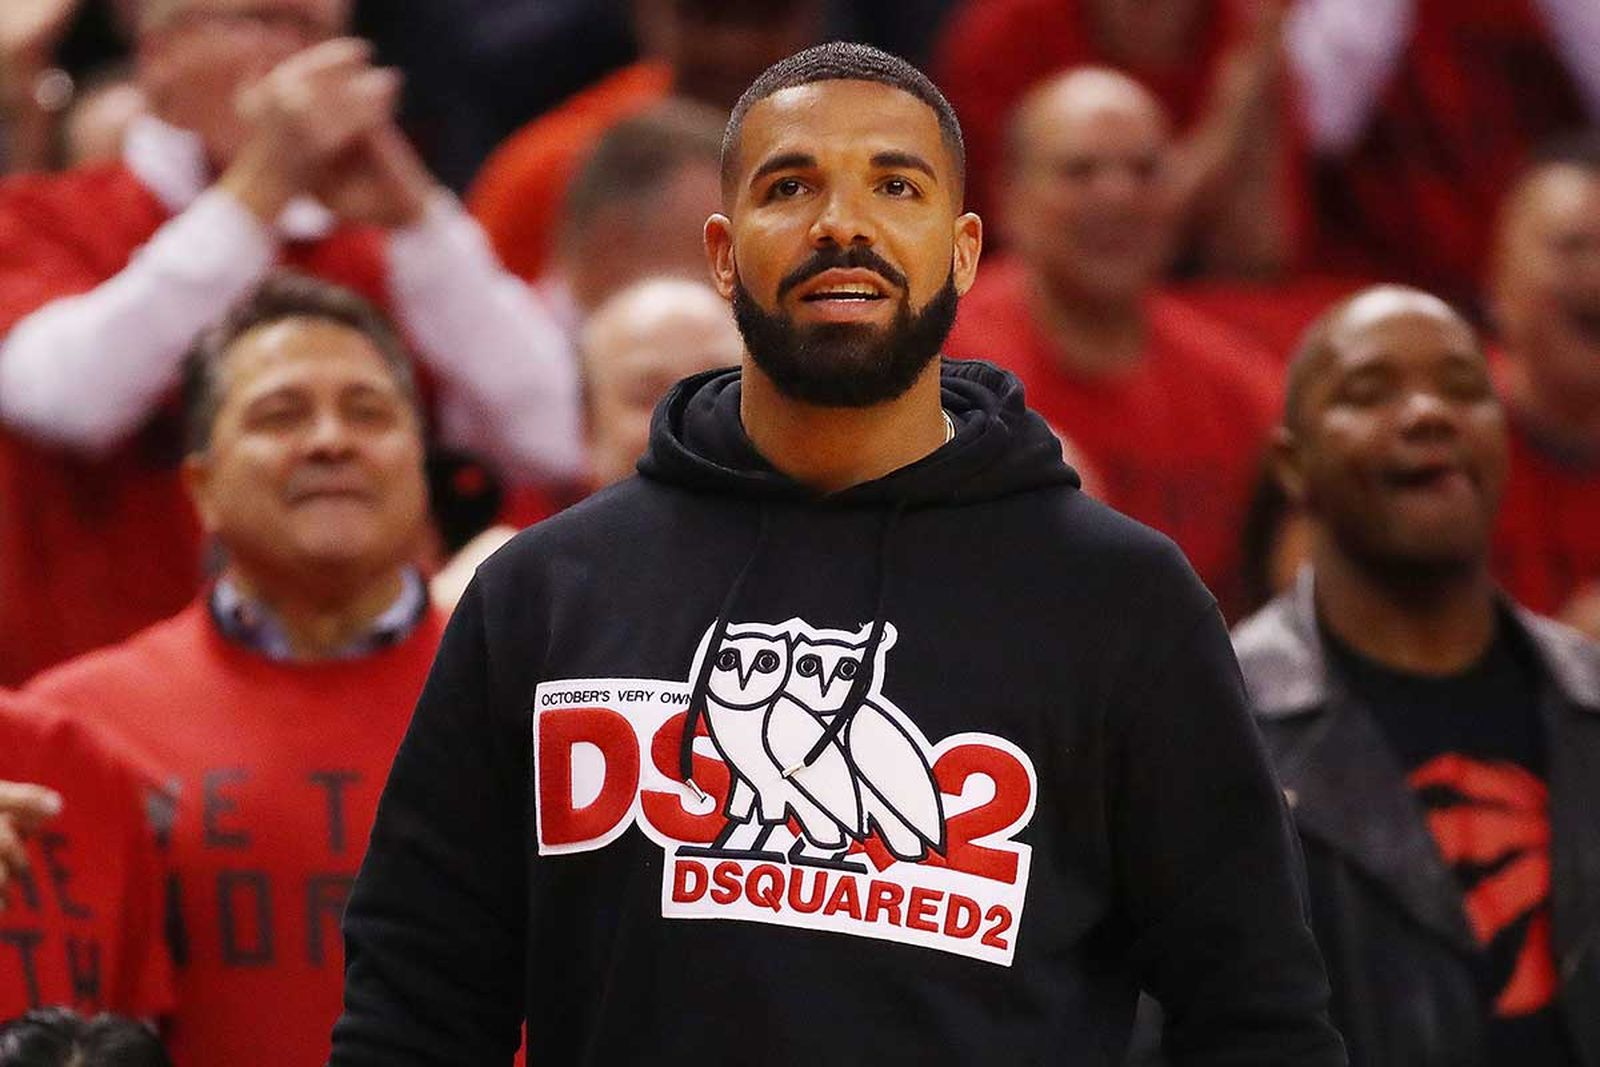 Drake wearing an OVO x DSQUARED2 hoodie